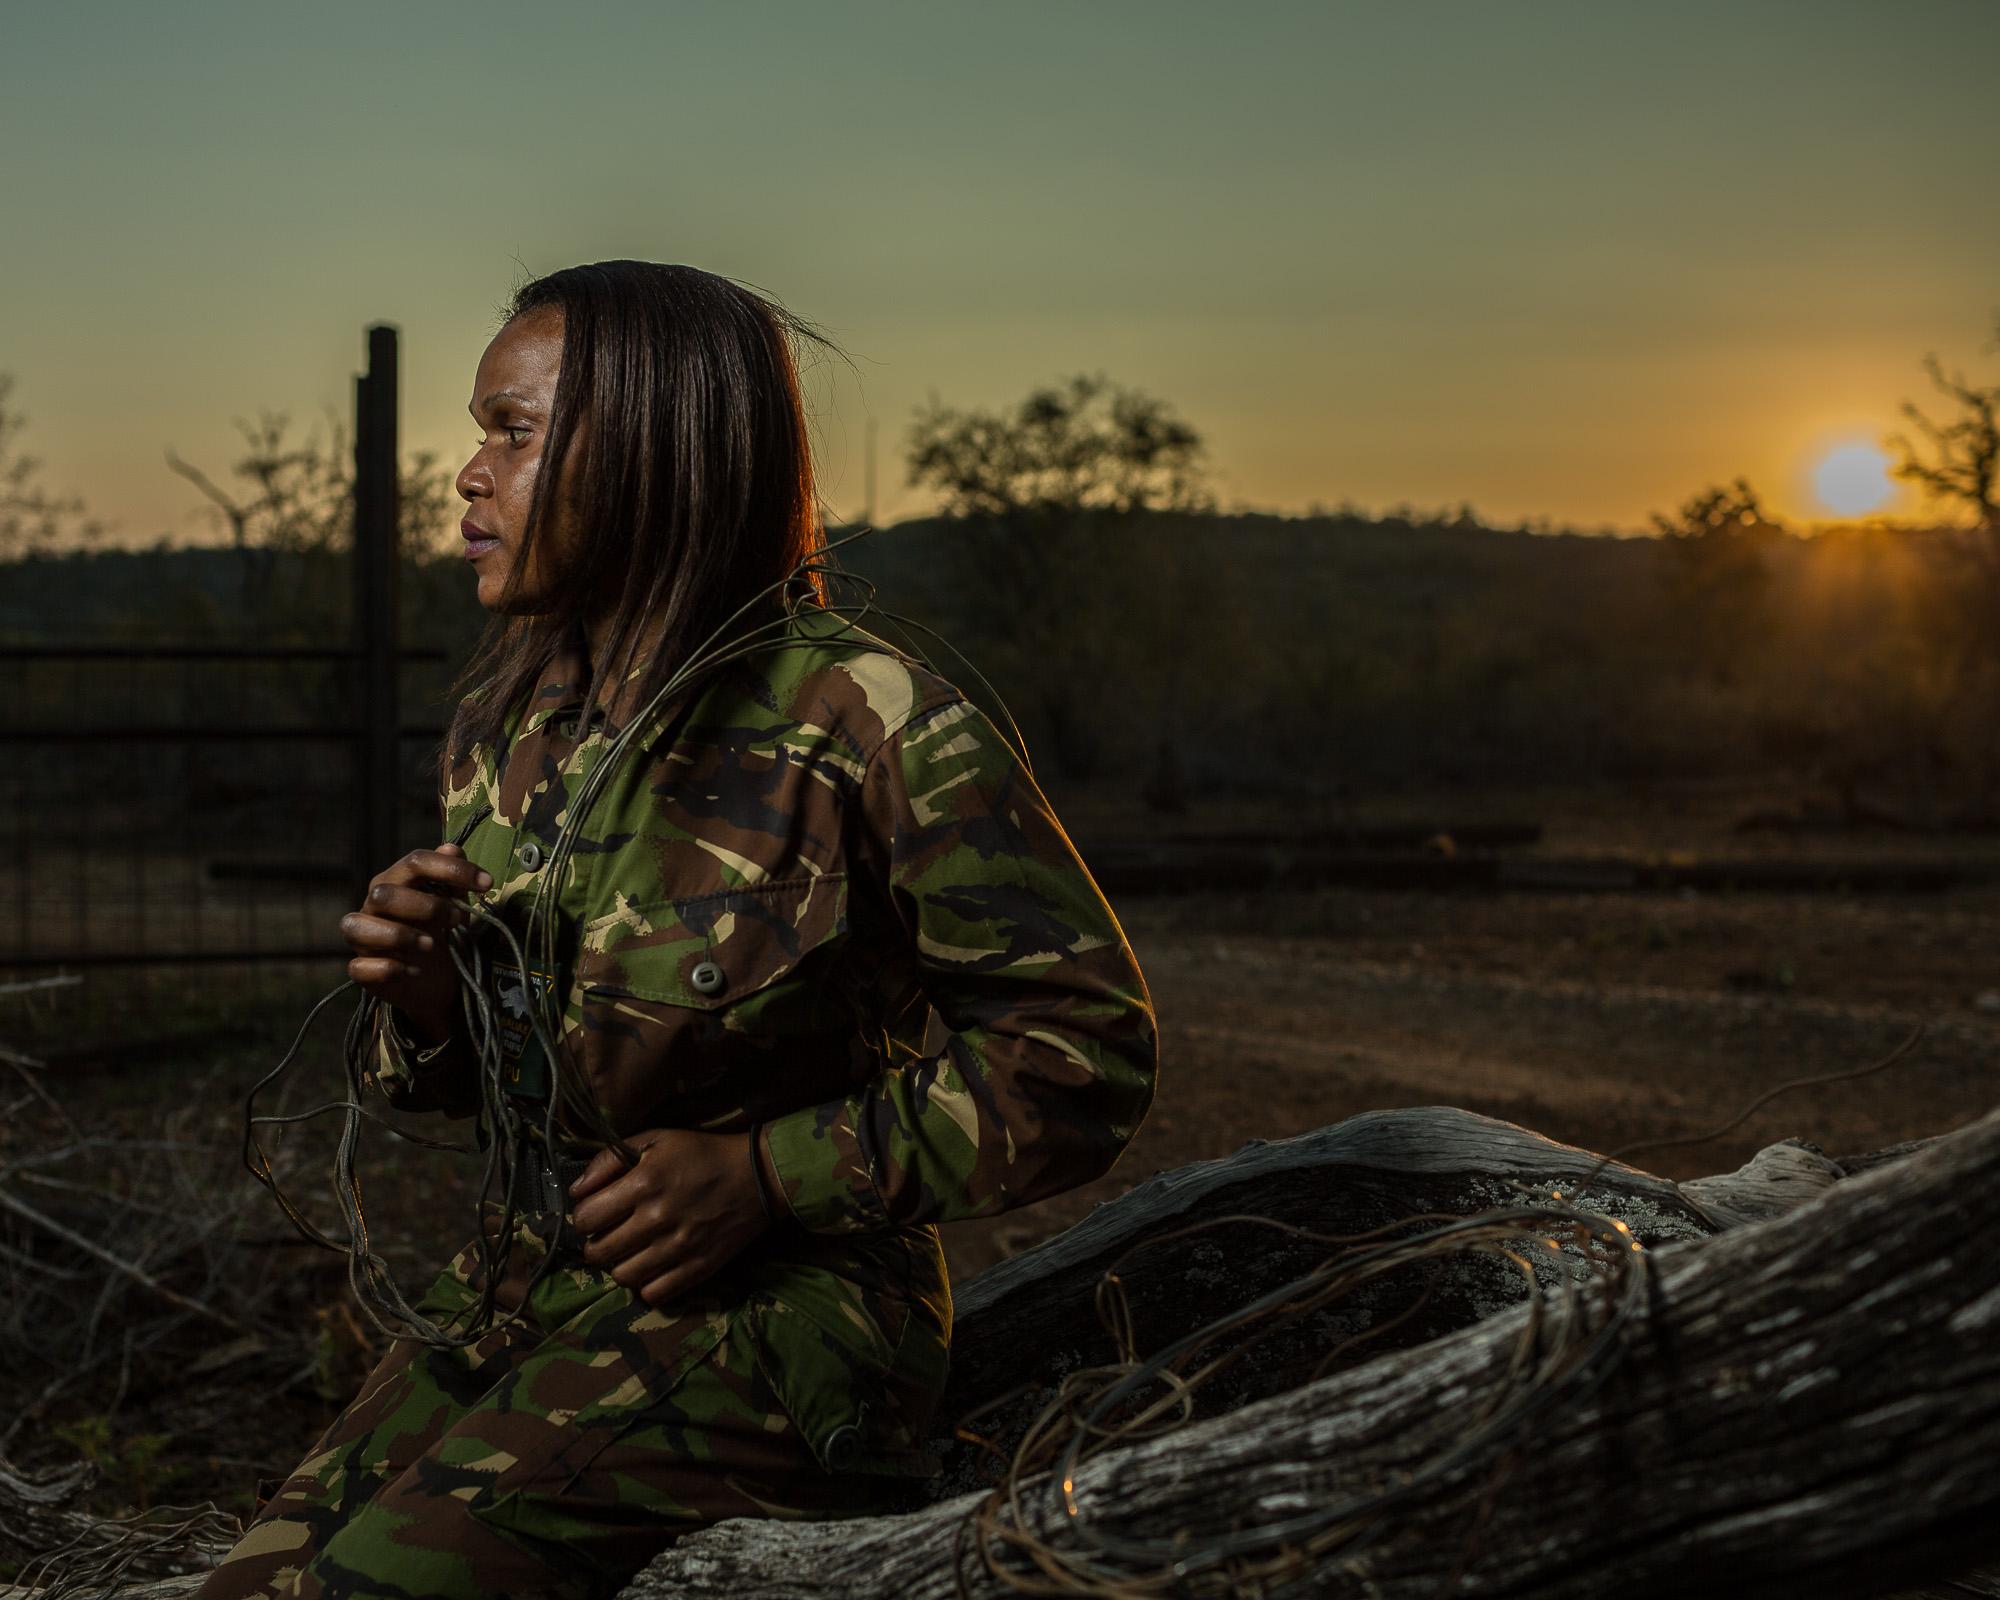 Lukie Mahlake,a member of the Black Mamba anti-poaching unit in Balule Game Reserve.